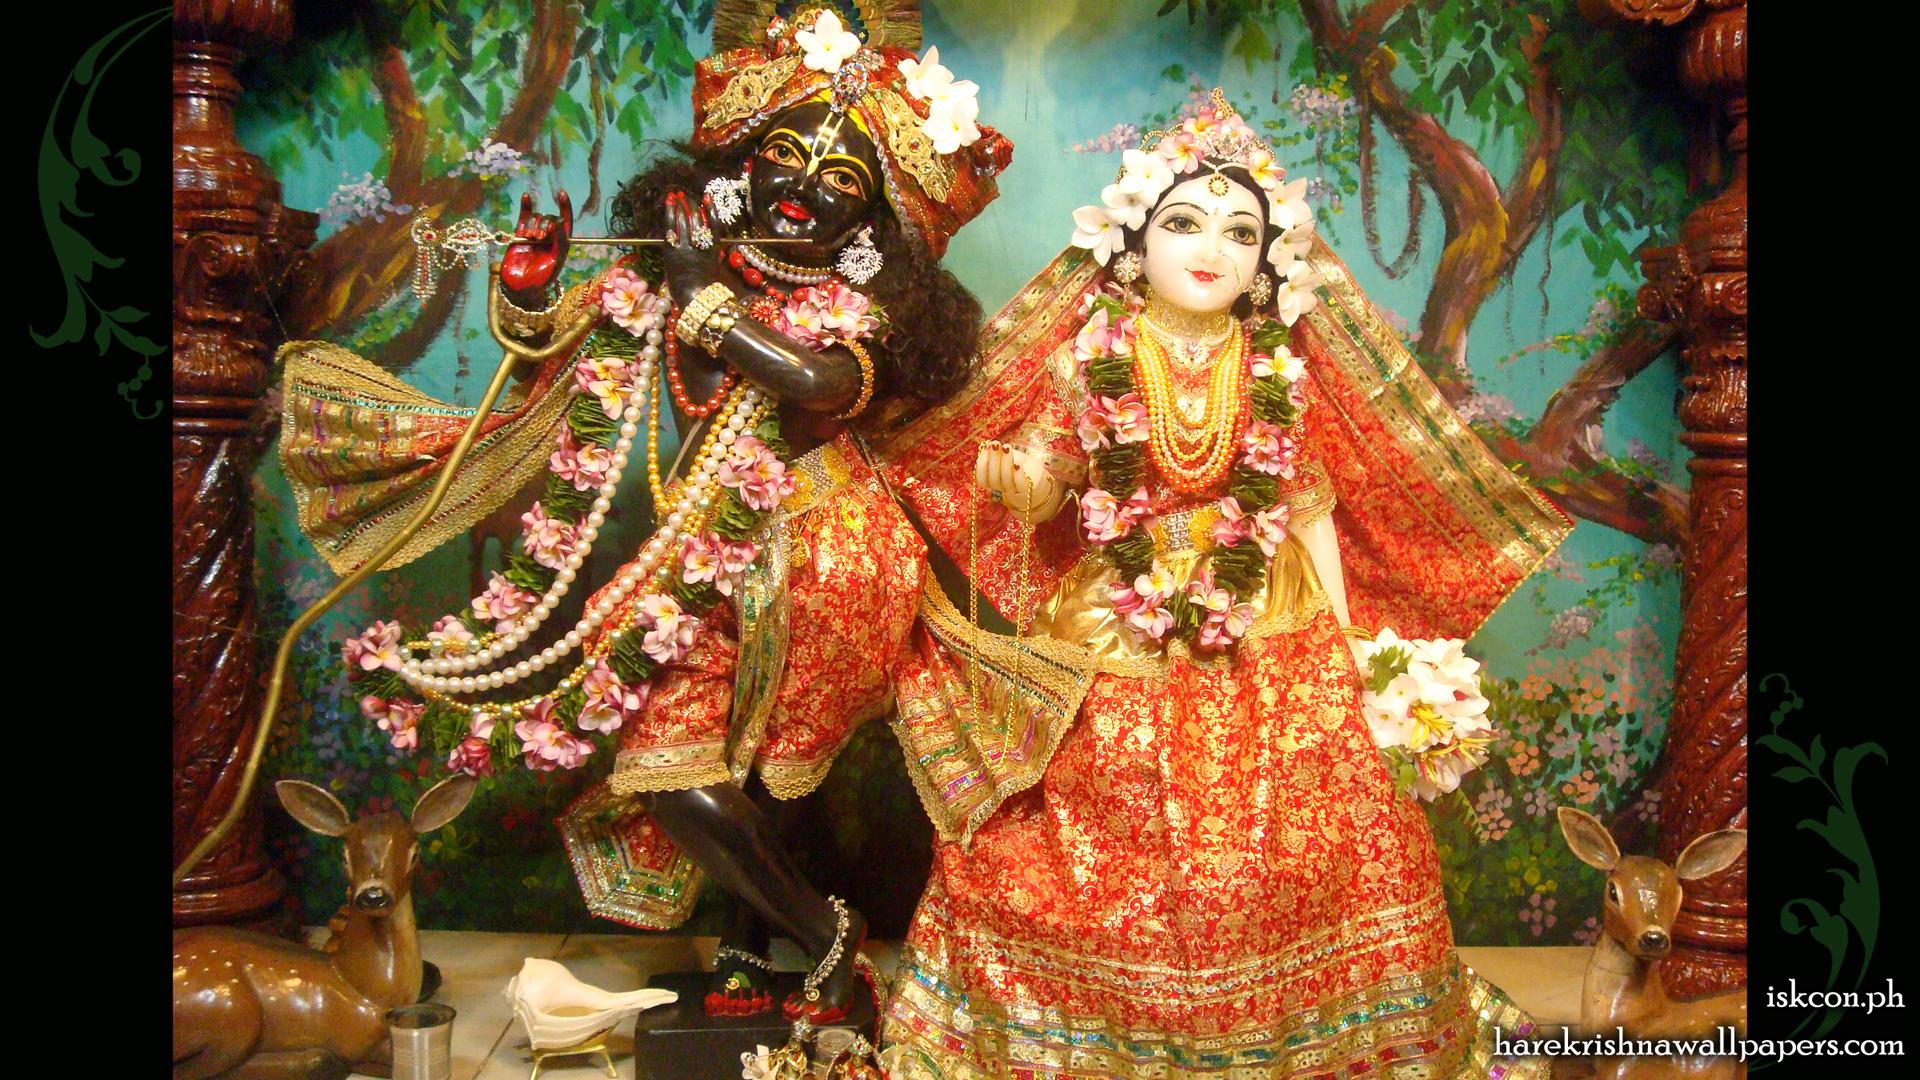 Sri Sri Radha Madhava Wallpaper (012) Size 1920x1080 Download